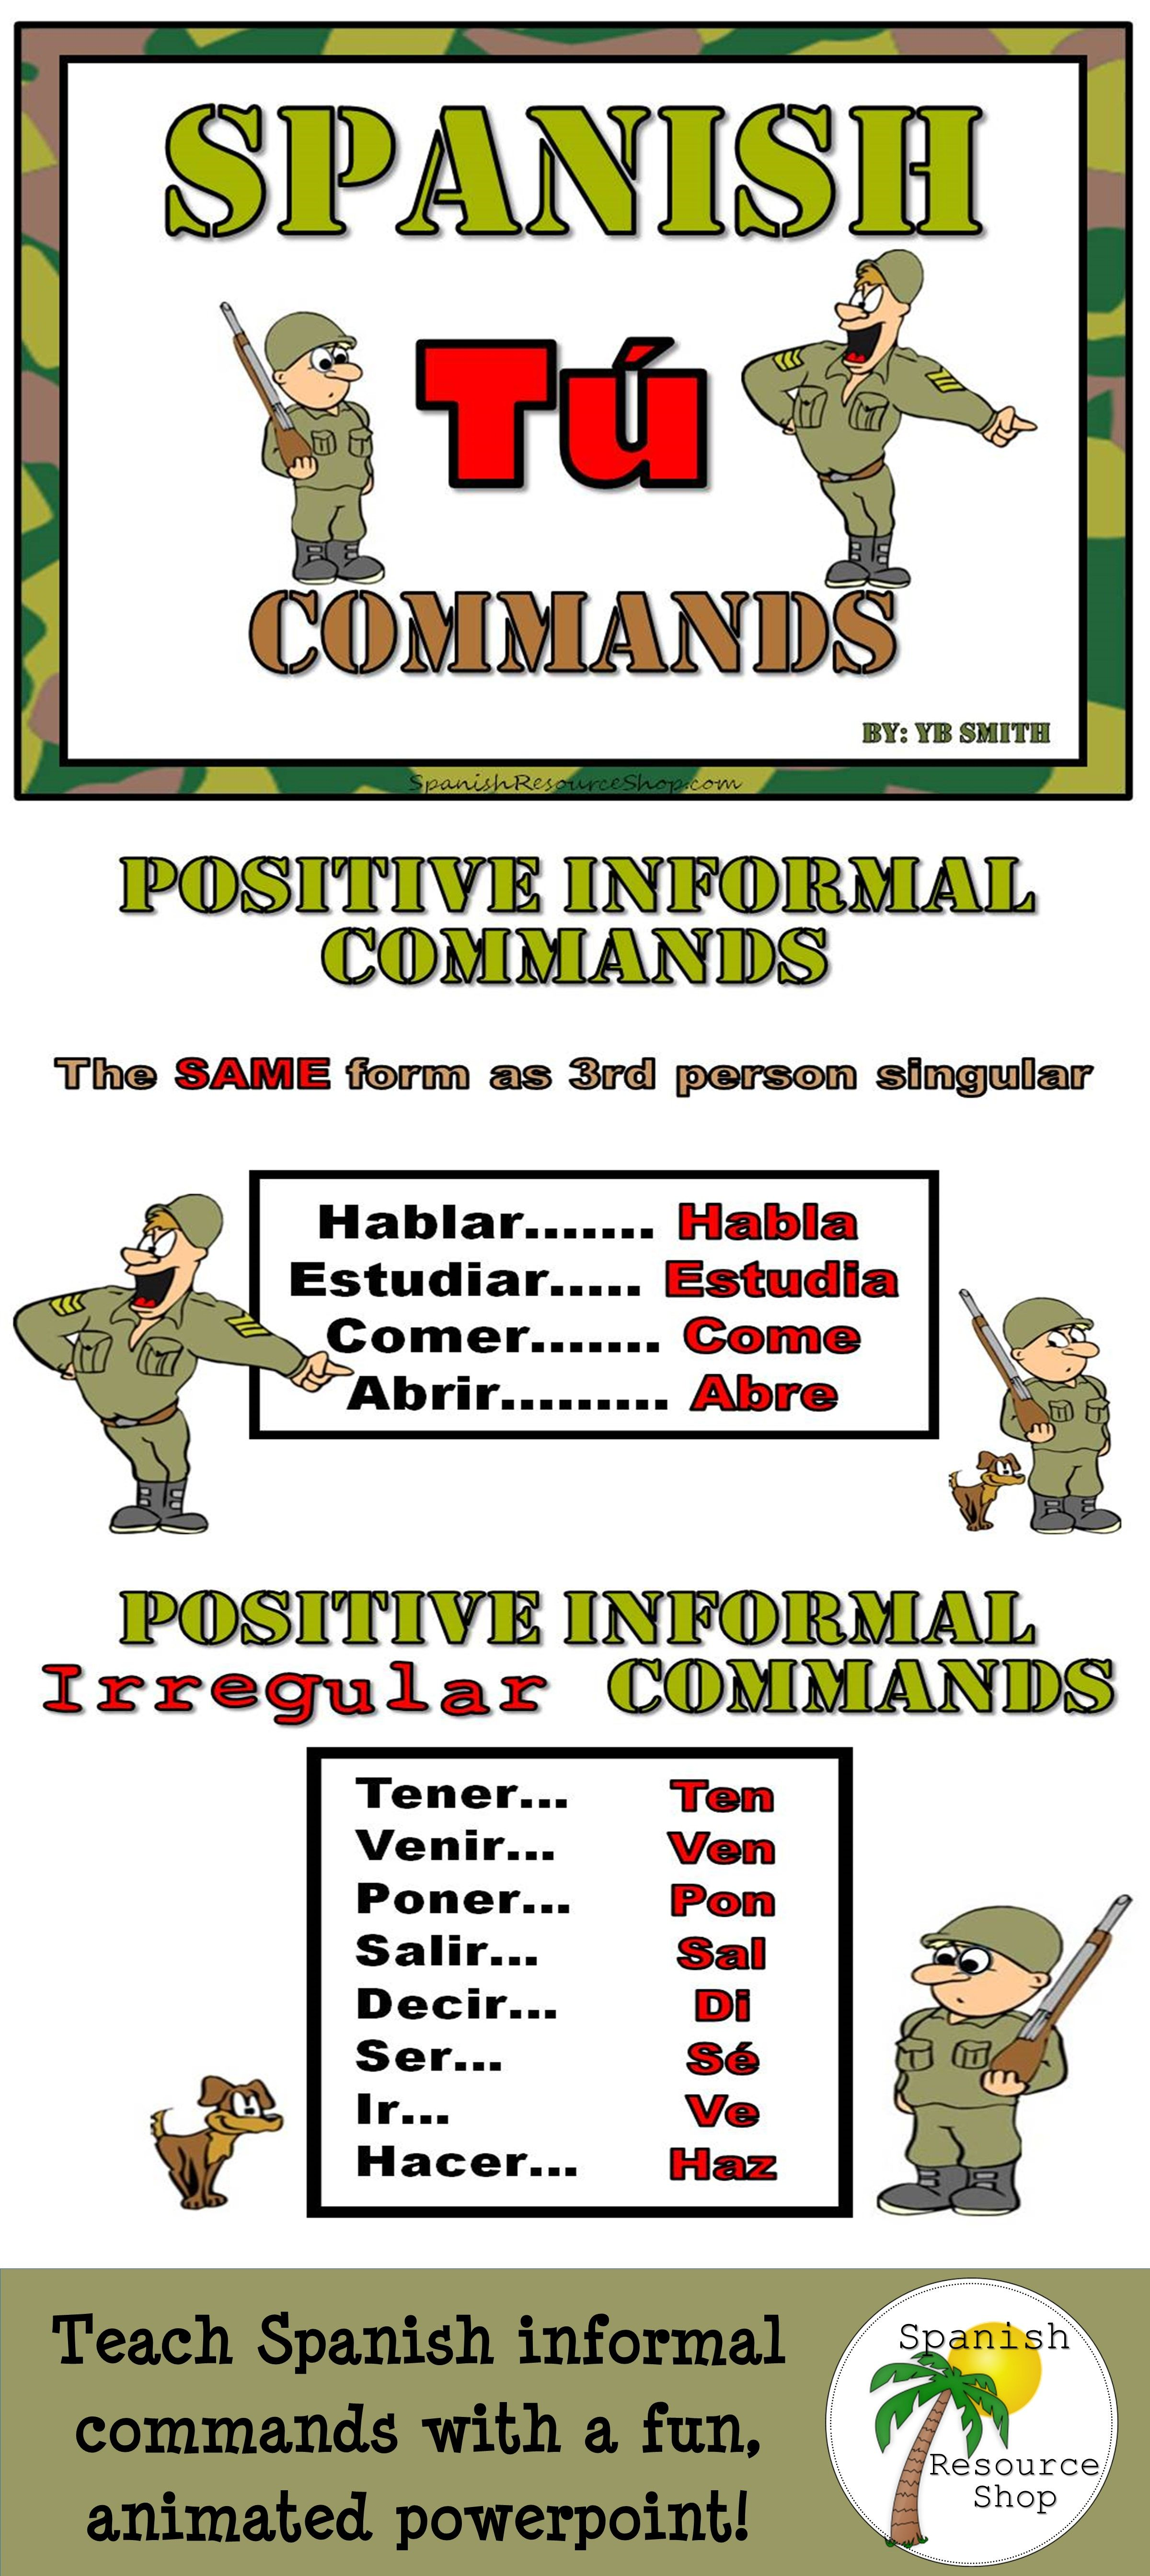 Spanish Informal Commands Grammar Notes And Practice